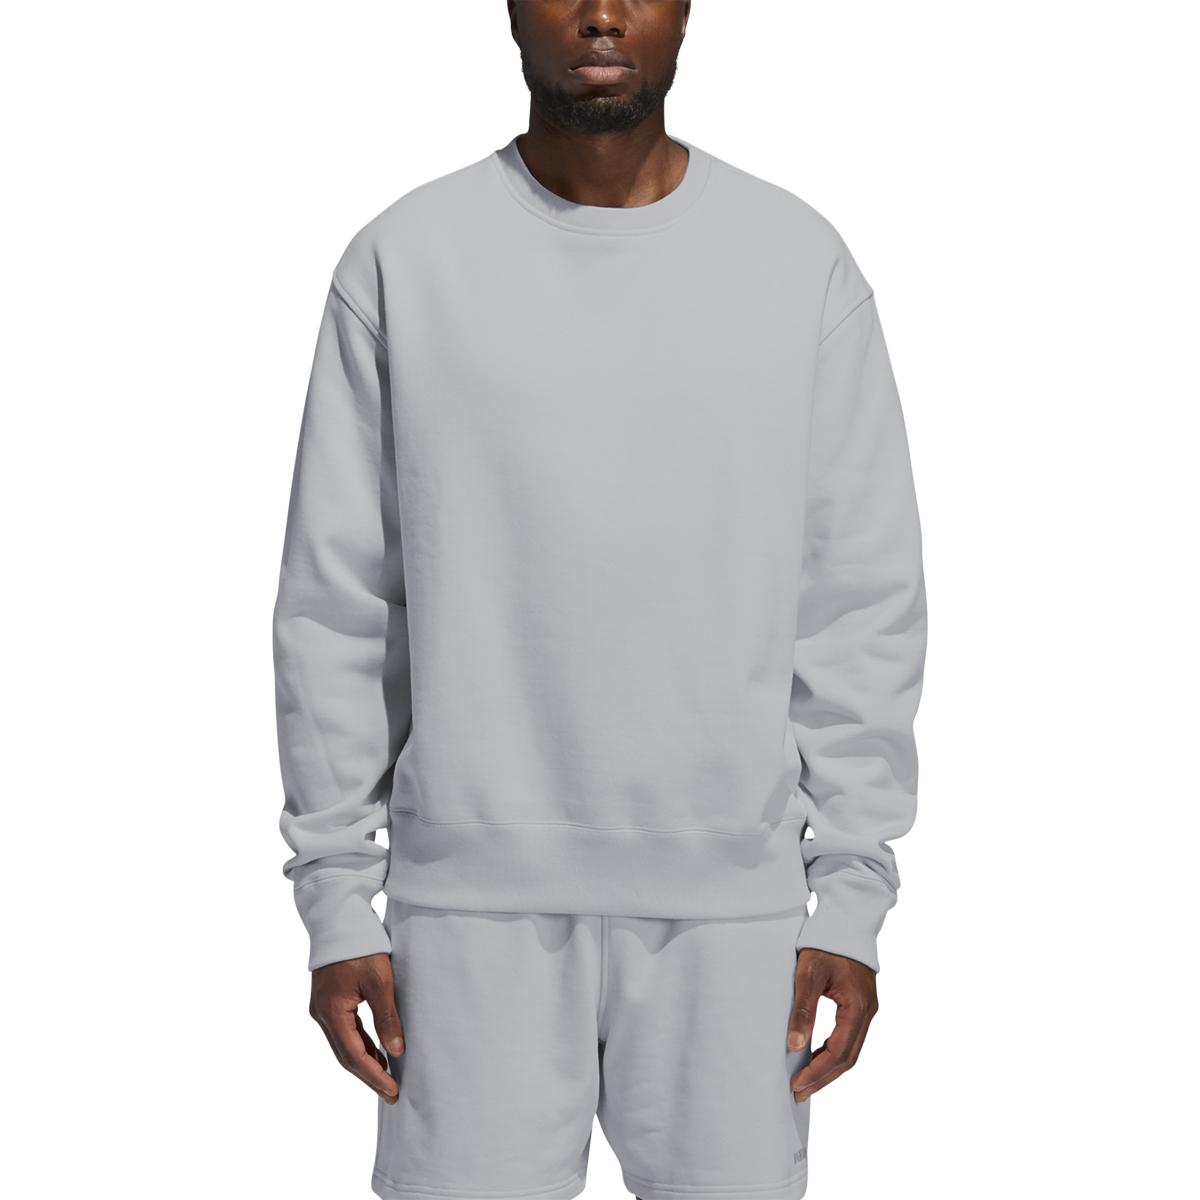 adidas X Pharrell Williams Basics Crewneck